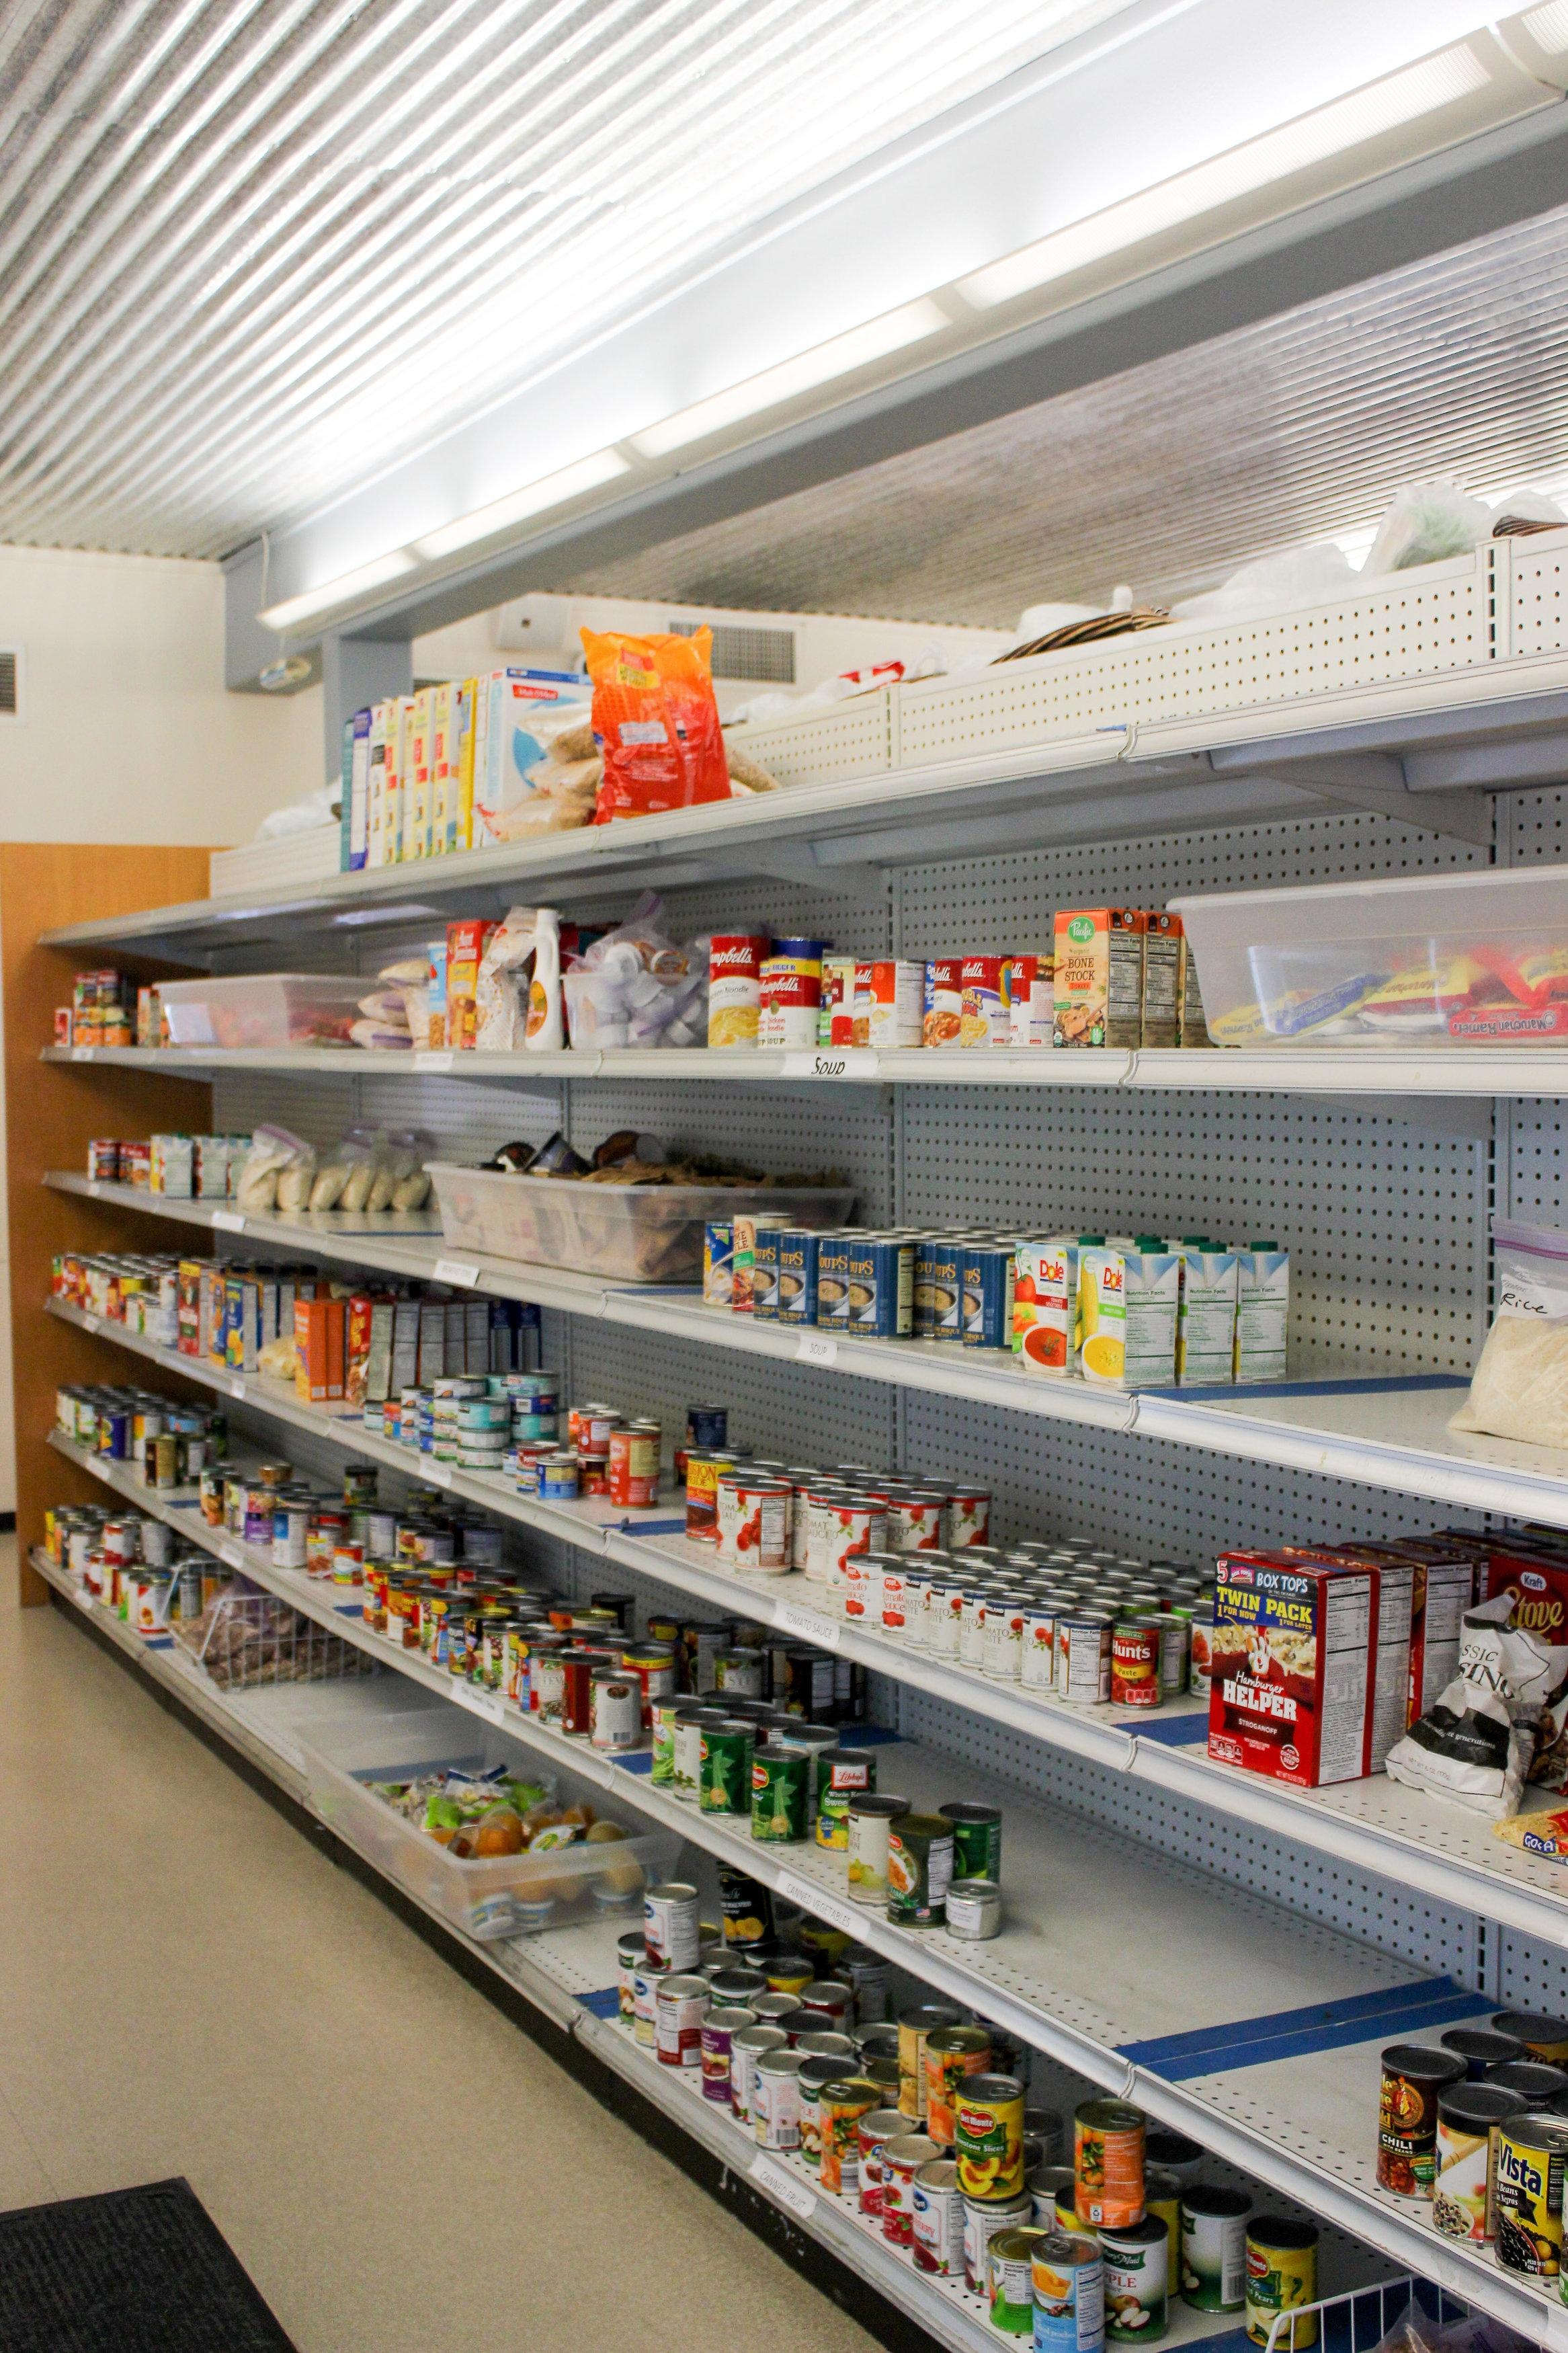 Awesome Saddleback Church Food Pantry #1: Foodpantry-7.jpg